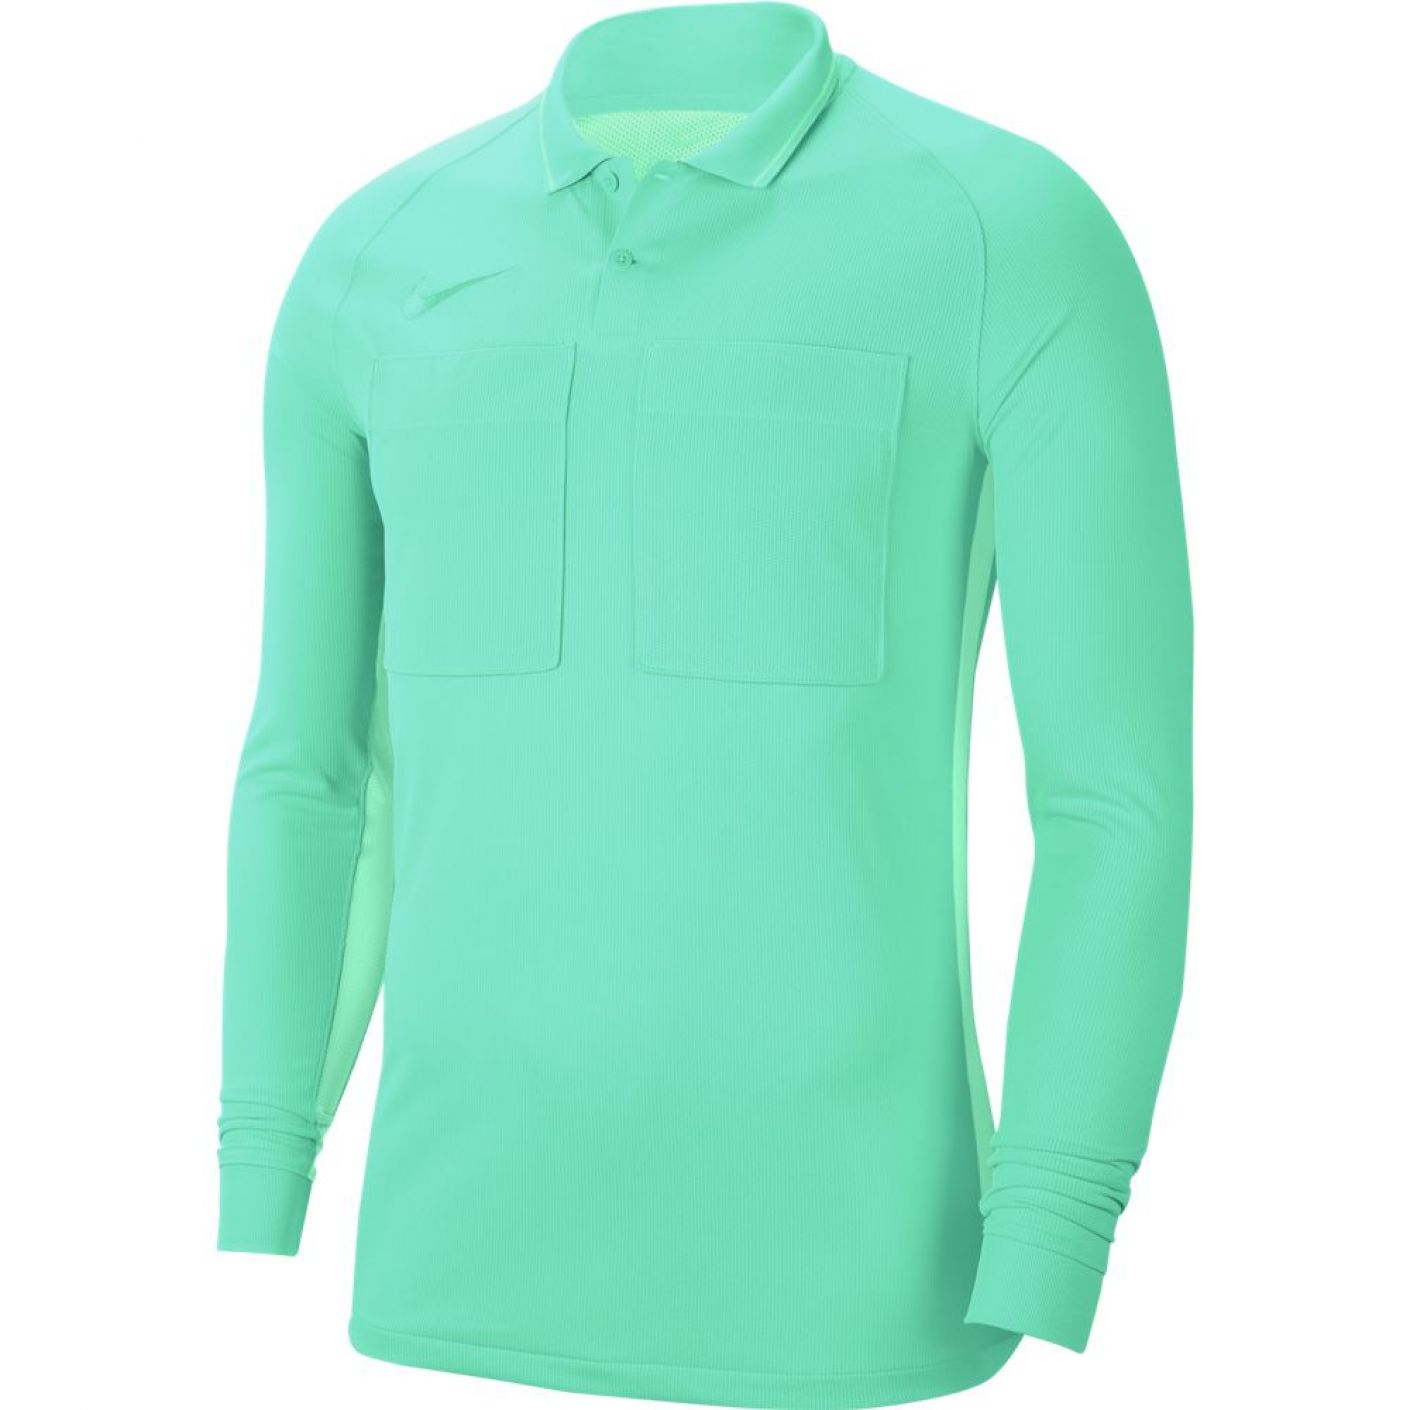 Nike Dry Scheidsrechtersshirt Lange Mouwen Turquoise